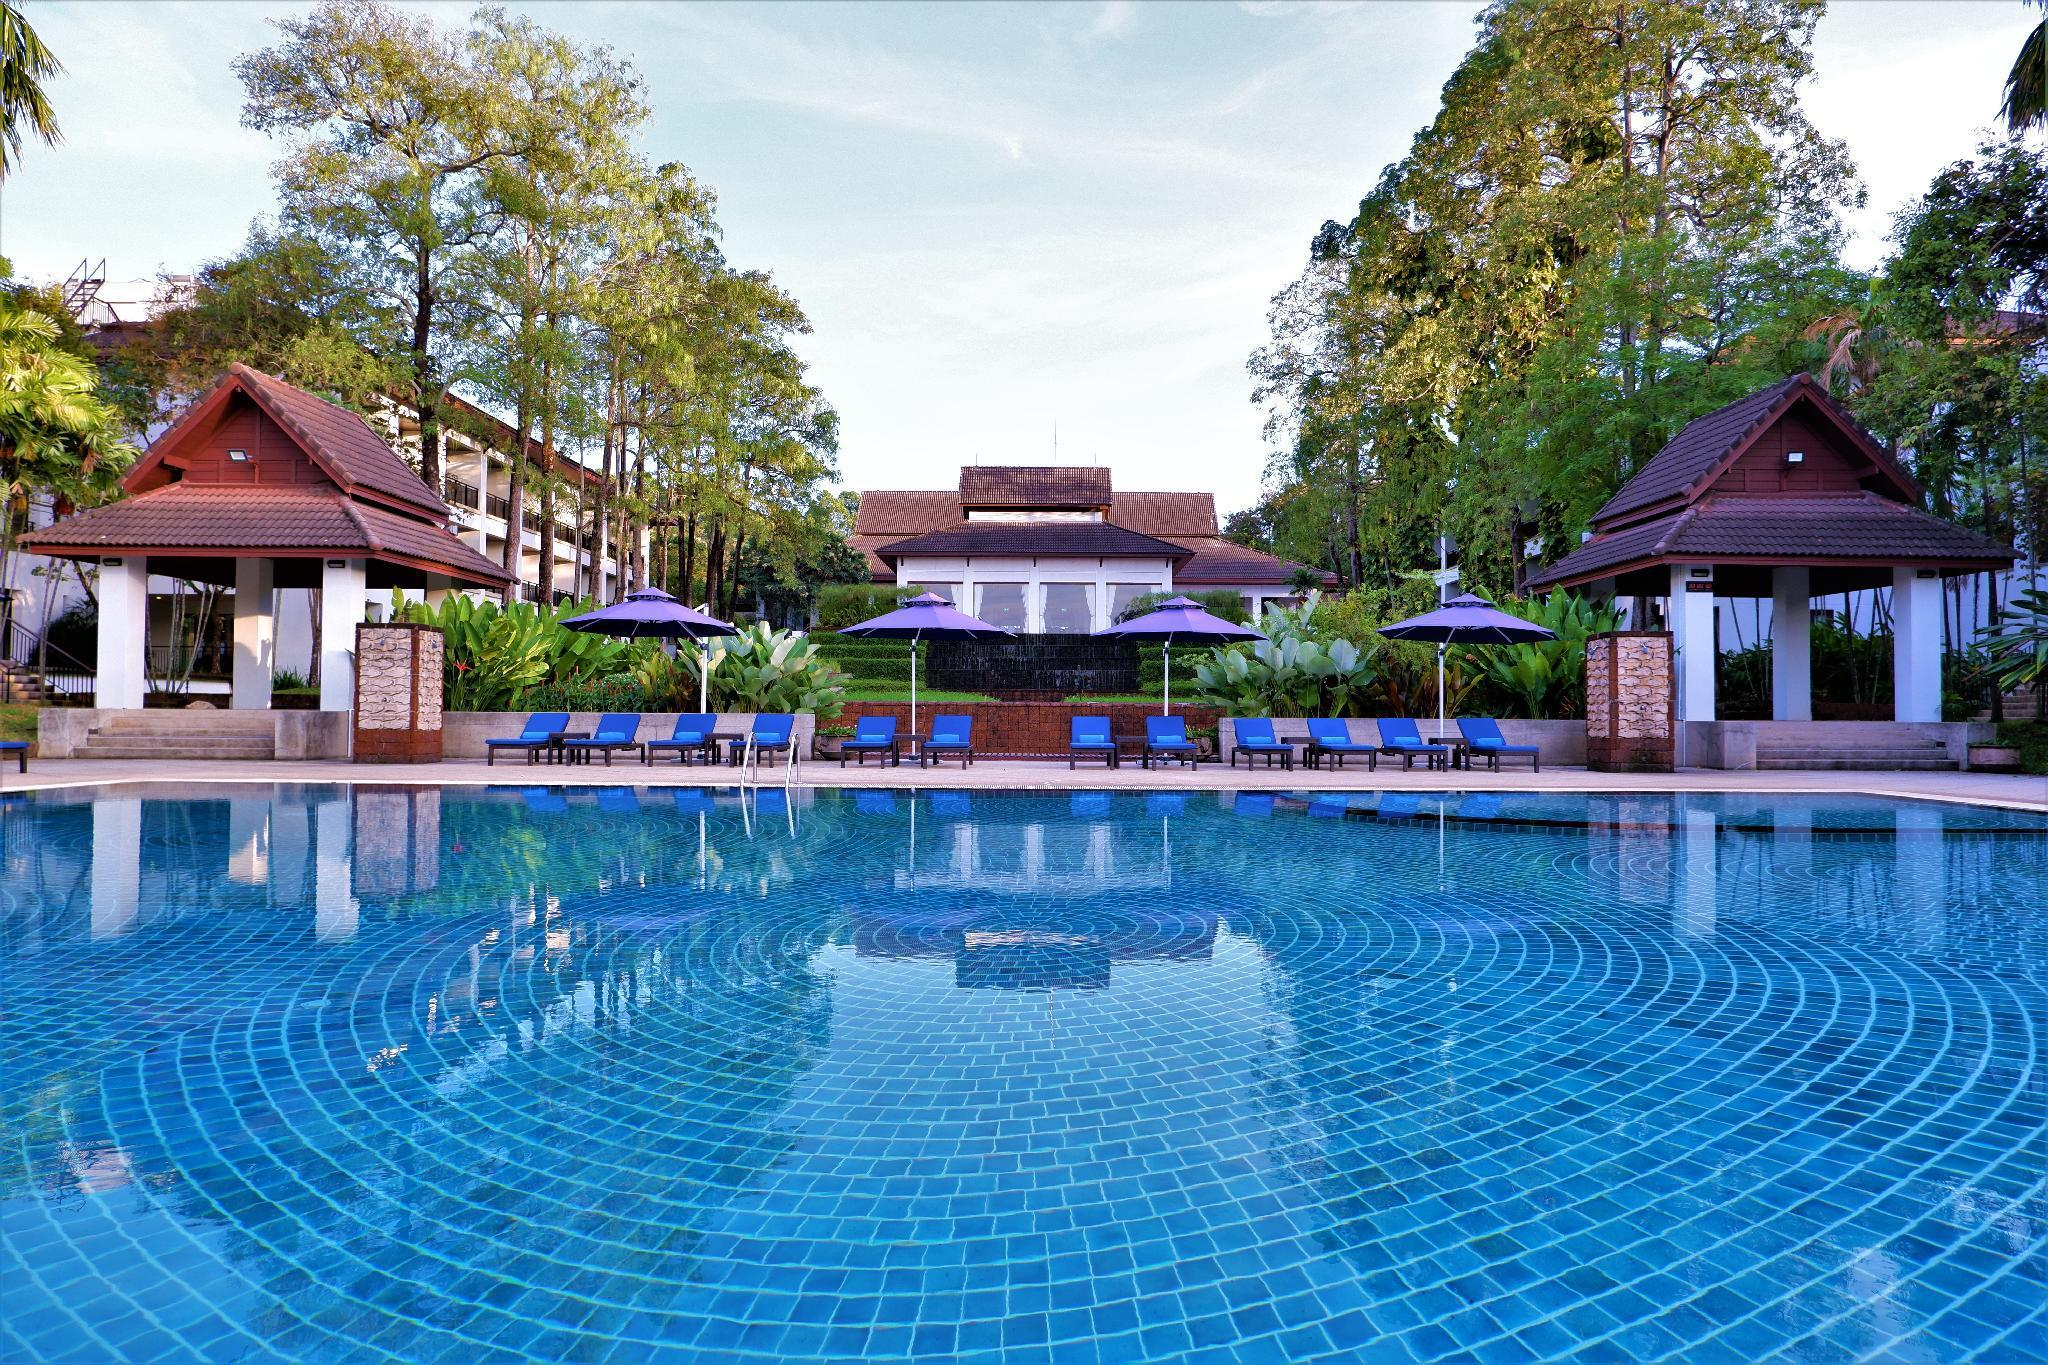 Tawaravadee Resort - Best Western Signature Collection ทวาราวดี รีสอร์ต - เบสต์เวสเทิร์น ซิกเนเจอร์ คอลเลคชั่น